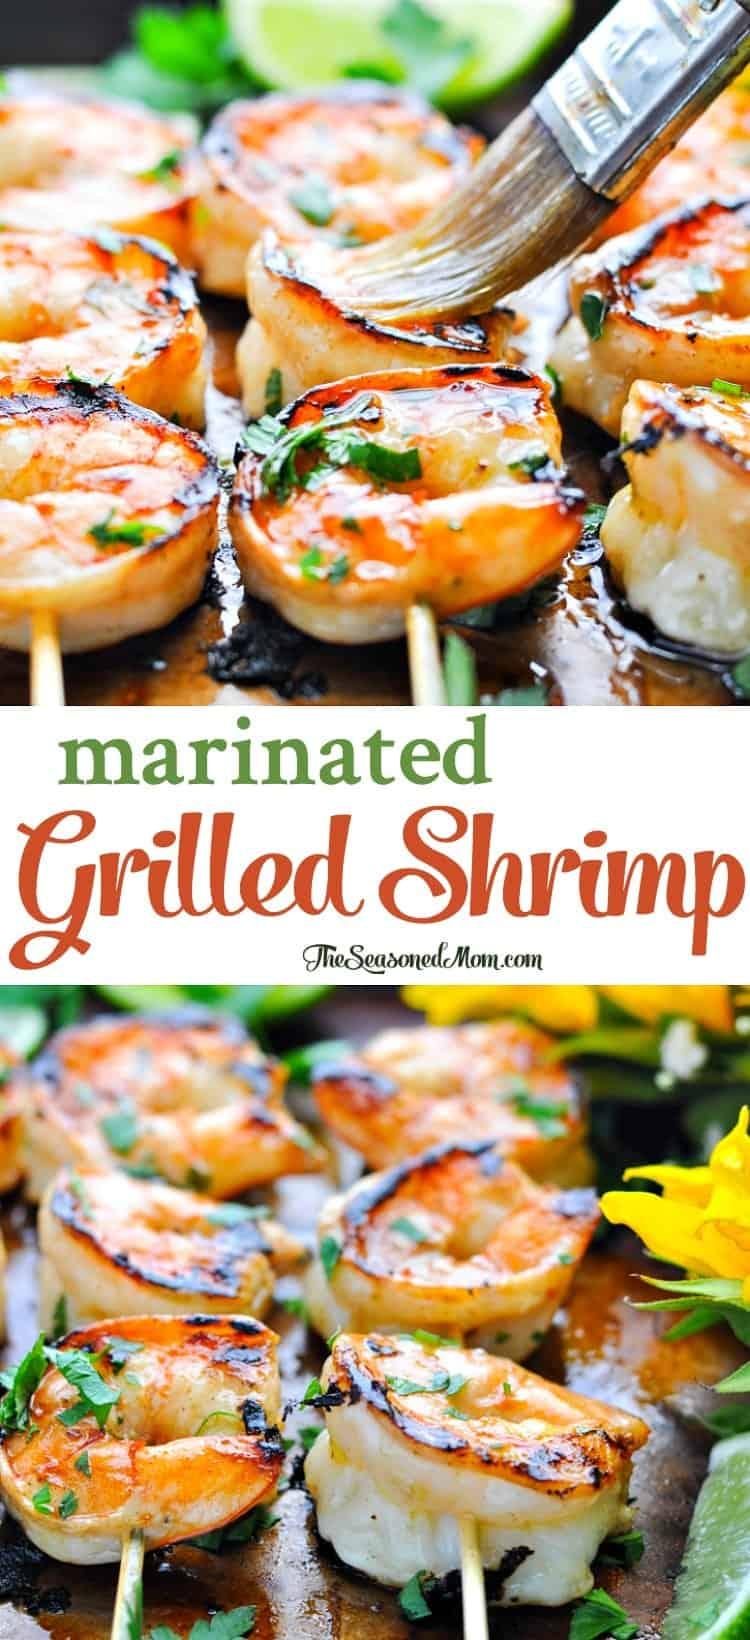 Marinated Grilled Shrimp   Easy Dinner Recipes   Healthy Dinner Recipes   Dinner Ideas   Shrimp Recipes   Grilling Recipes   Healthy Recipes   Seafood Recipes   Clean Eating Recipes   Clean Eating Dinner